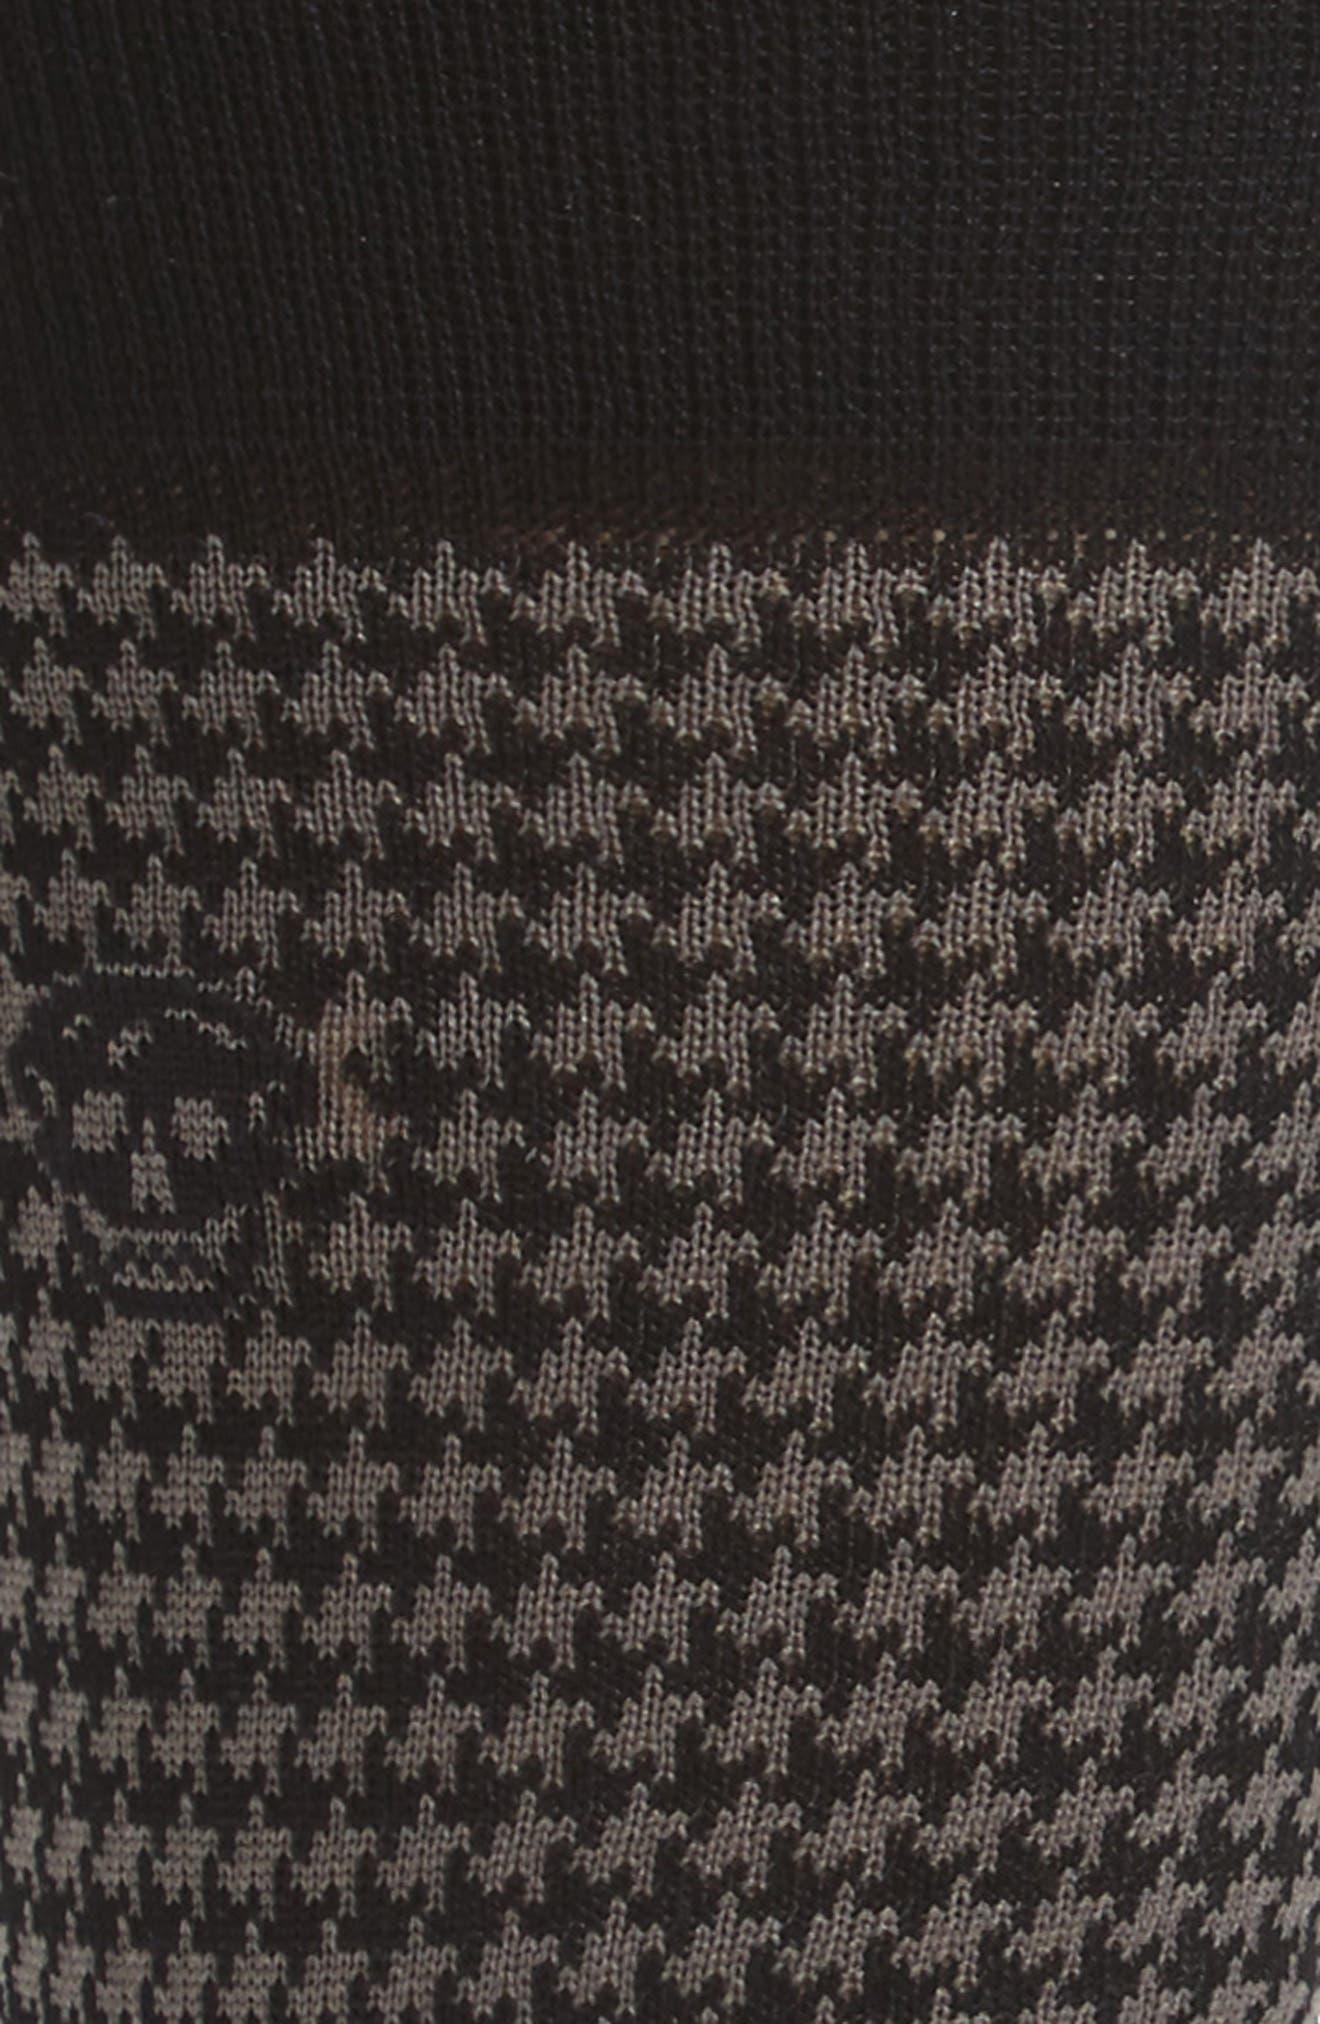 Cotton Blend Houndstooth Socks,                             Alternate thumbnail 2, color,                             Black/ Dark Grey